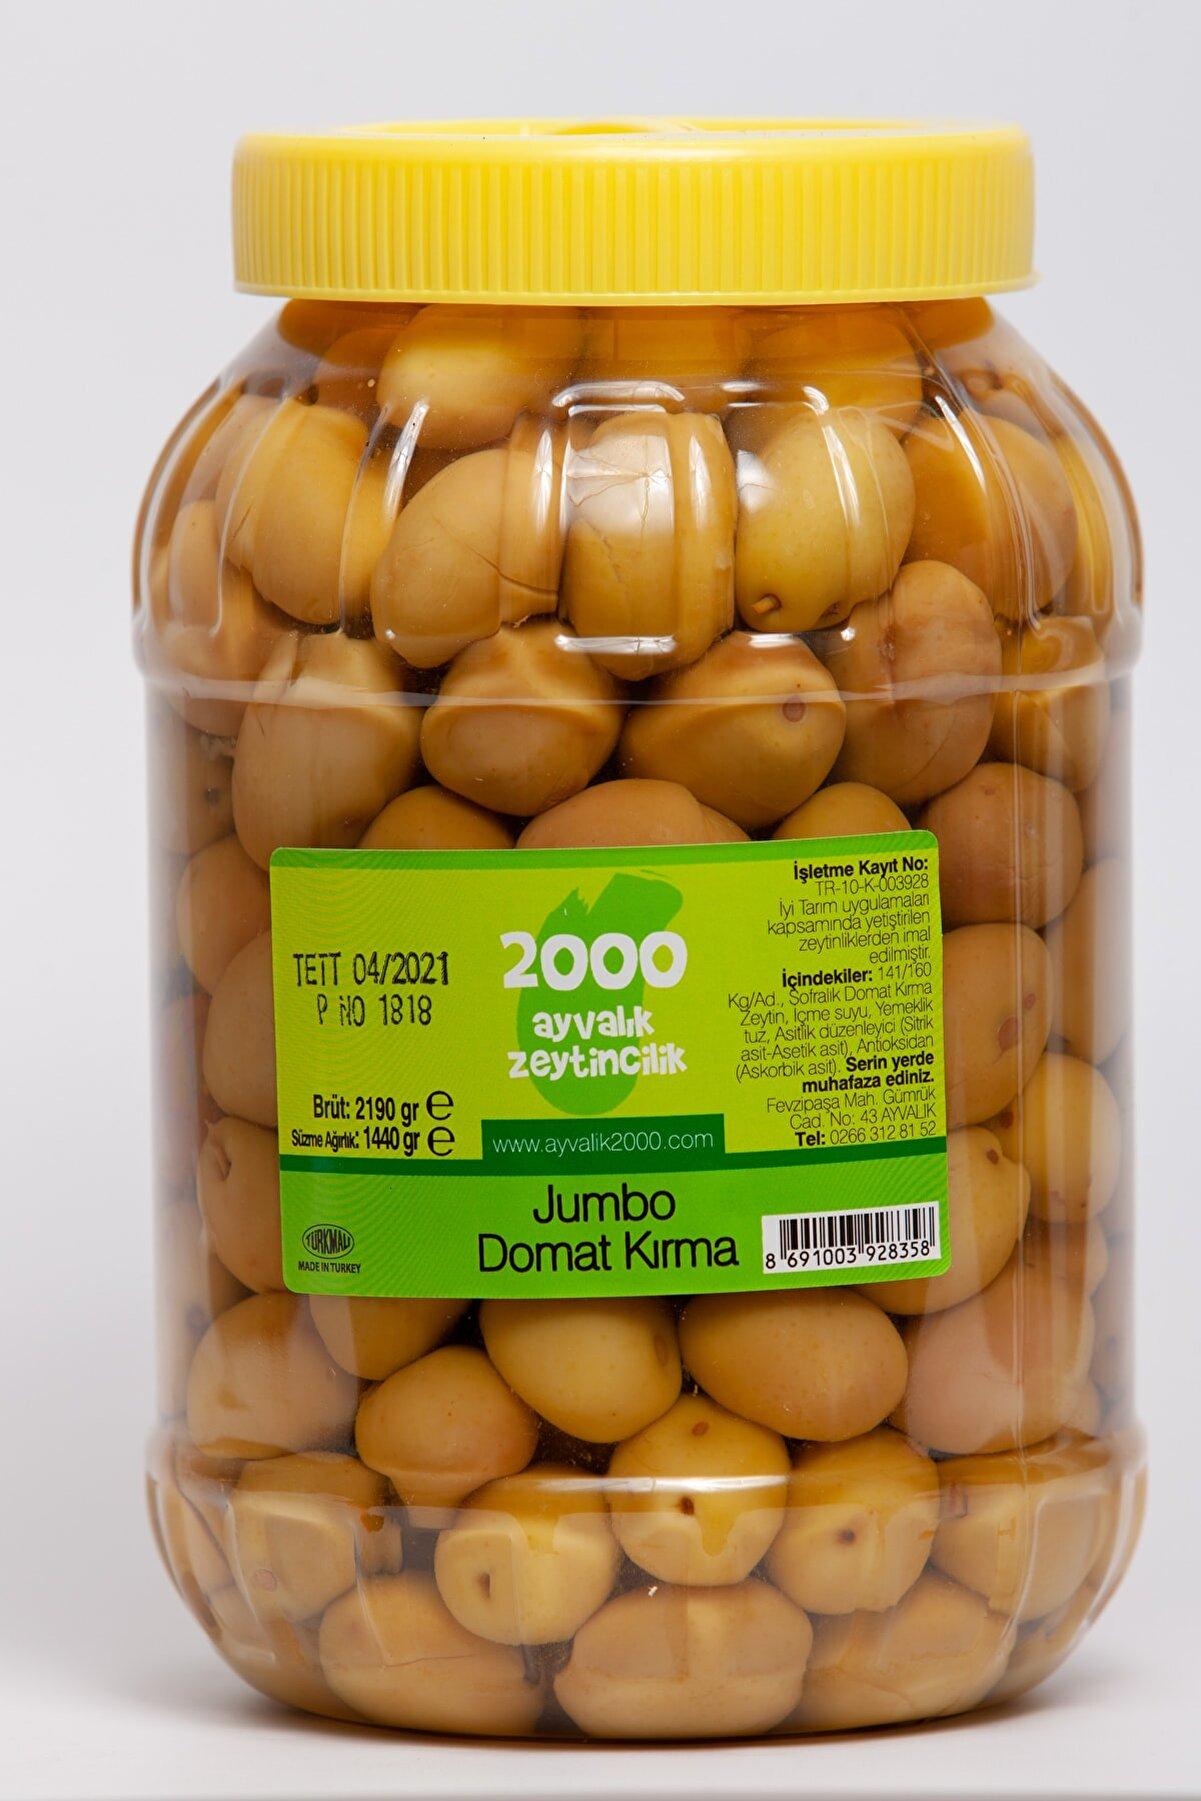 2000 AYVALIK ZEYTİNCİLİK Jumbo Domat Kırma 1440 gr. (4xl-141-160 kg/ad)